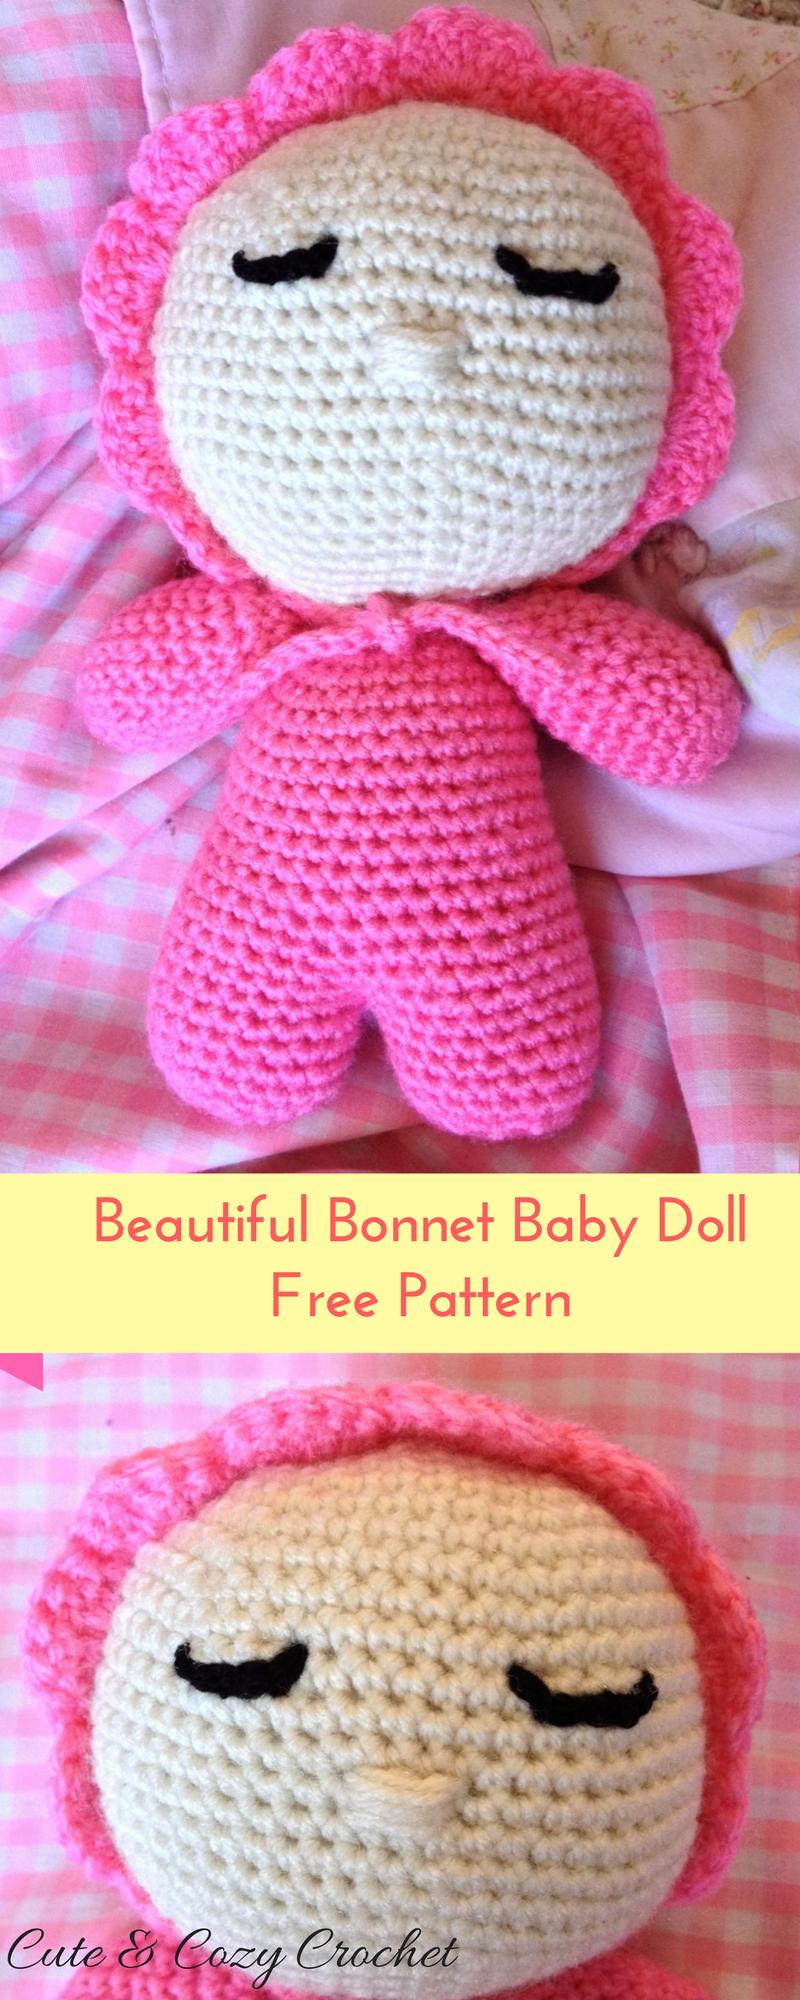 The Beautiful Bonnet Baby Doll - Cute & Cozy Crochet #babydoll